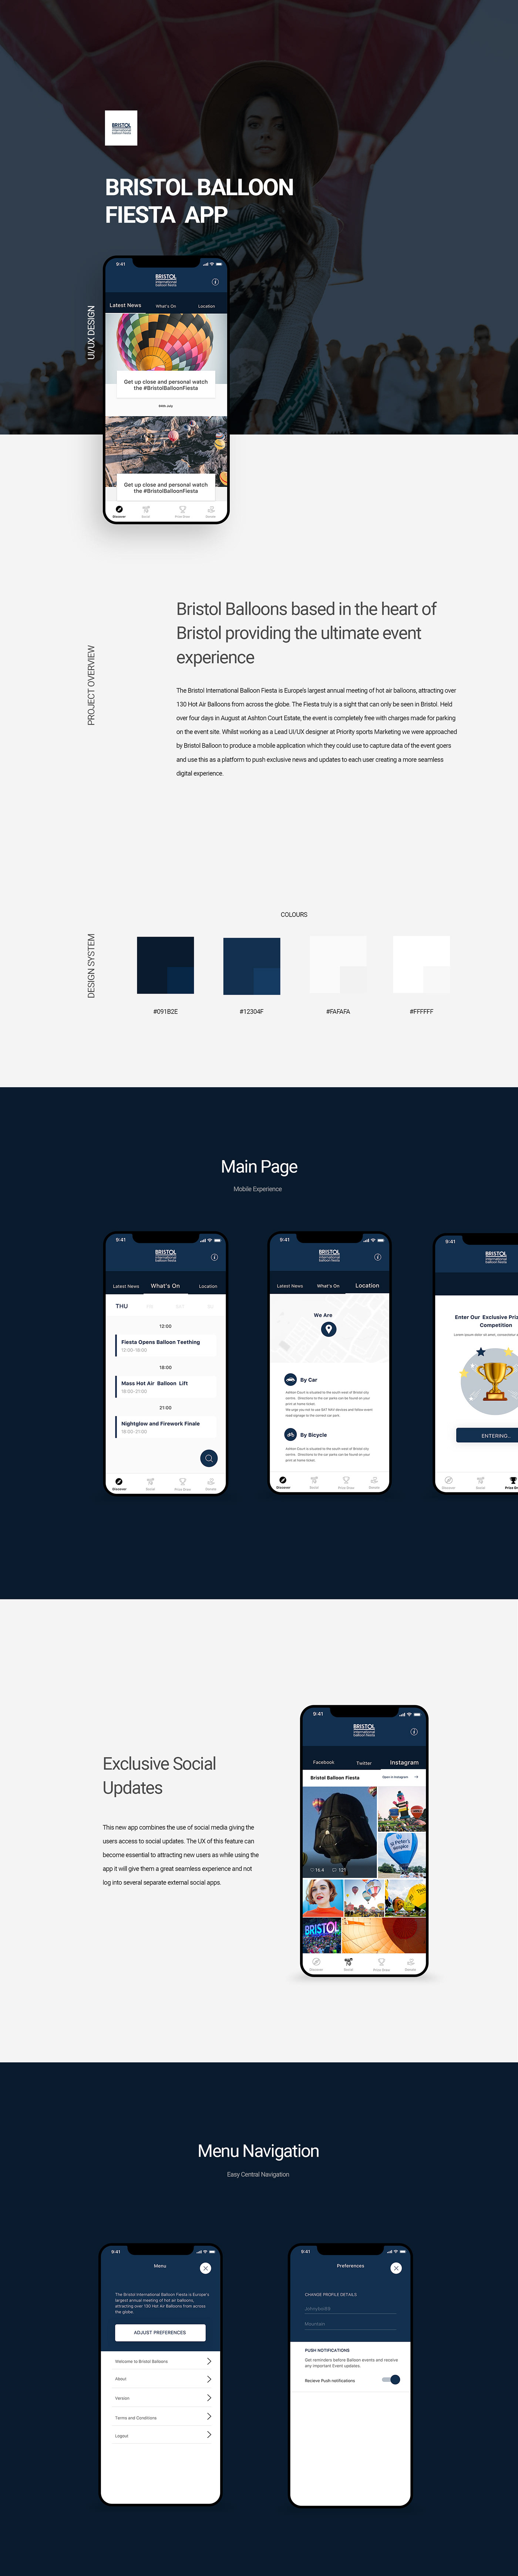 UI ux app Bristol balloon user-experience digital design